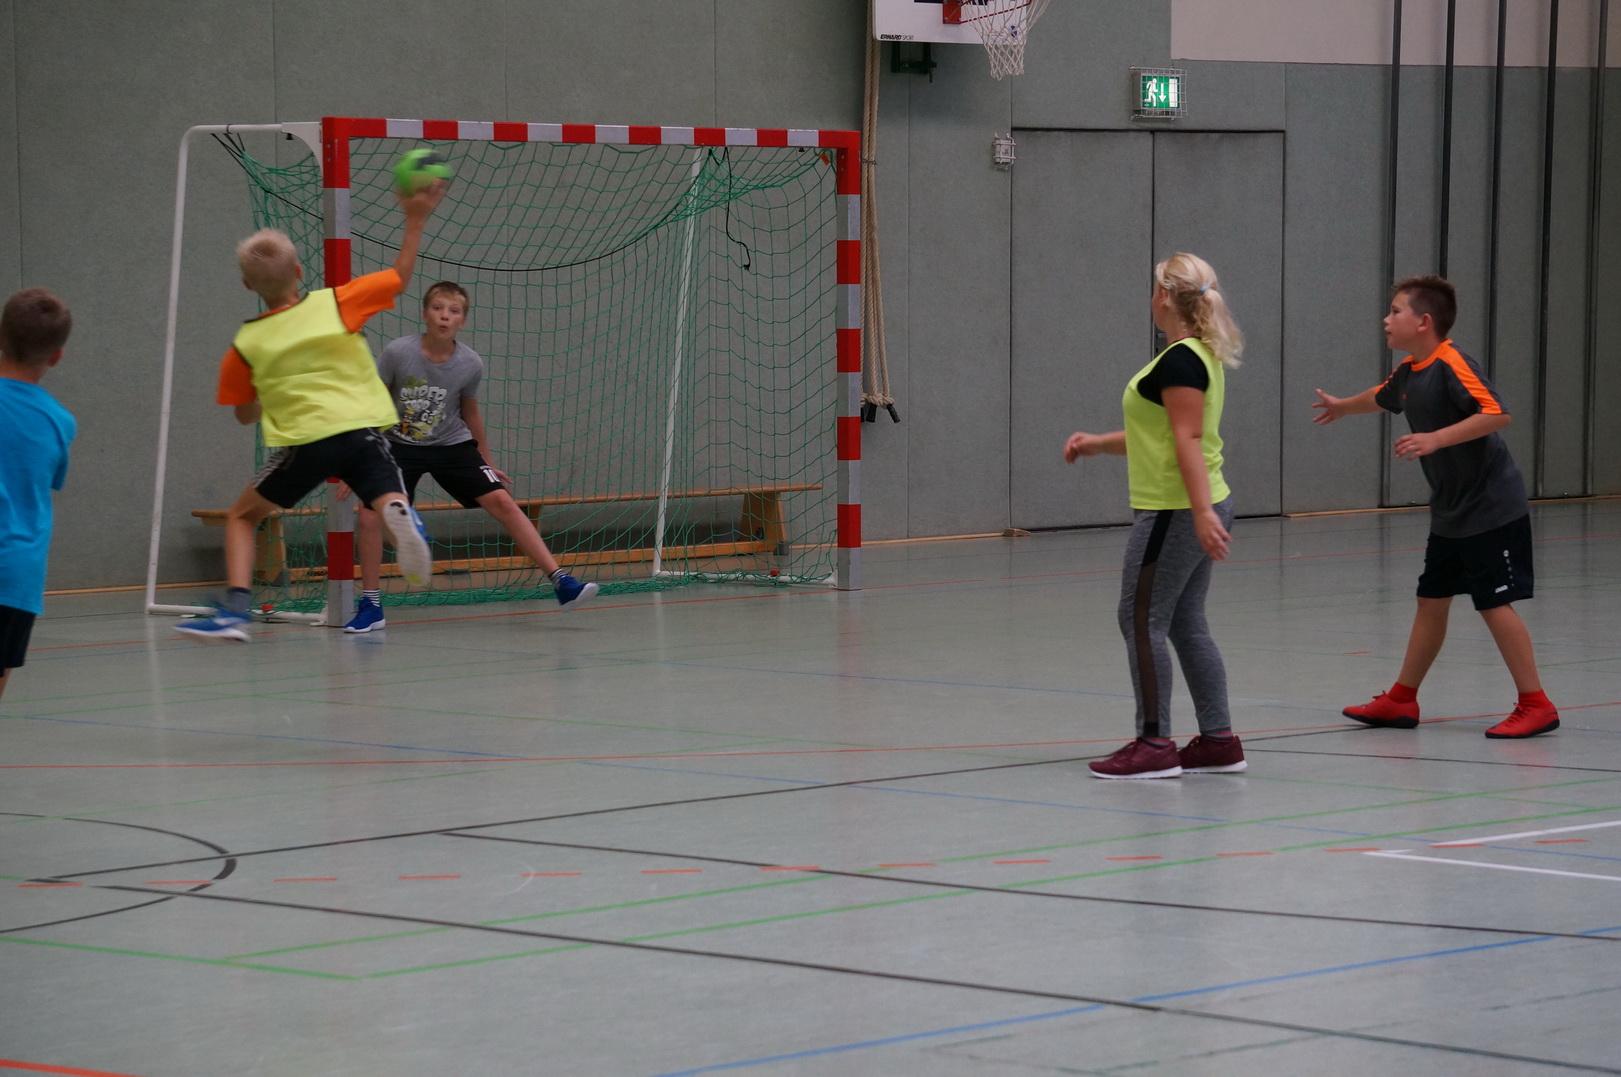 201808_Handballcamp_SDH_MG_118w